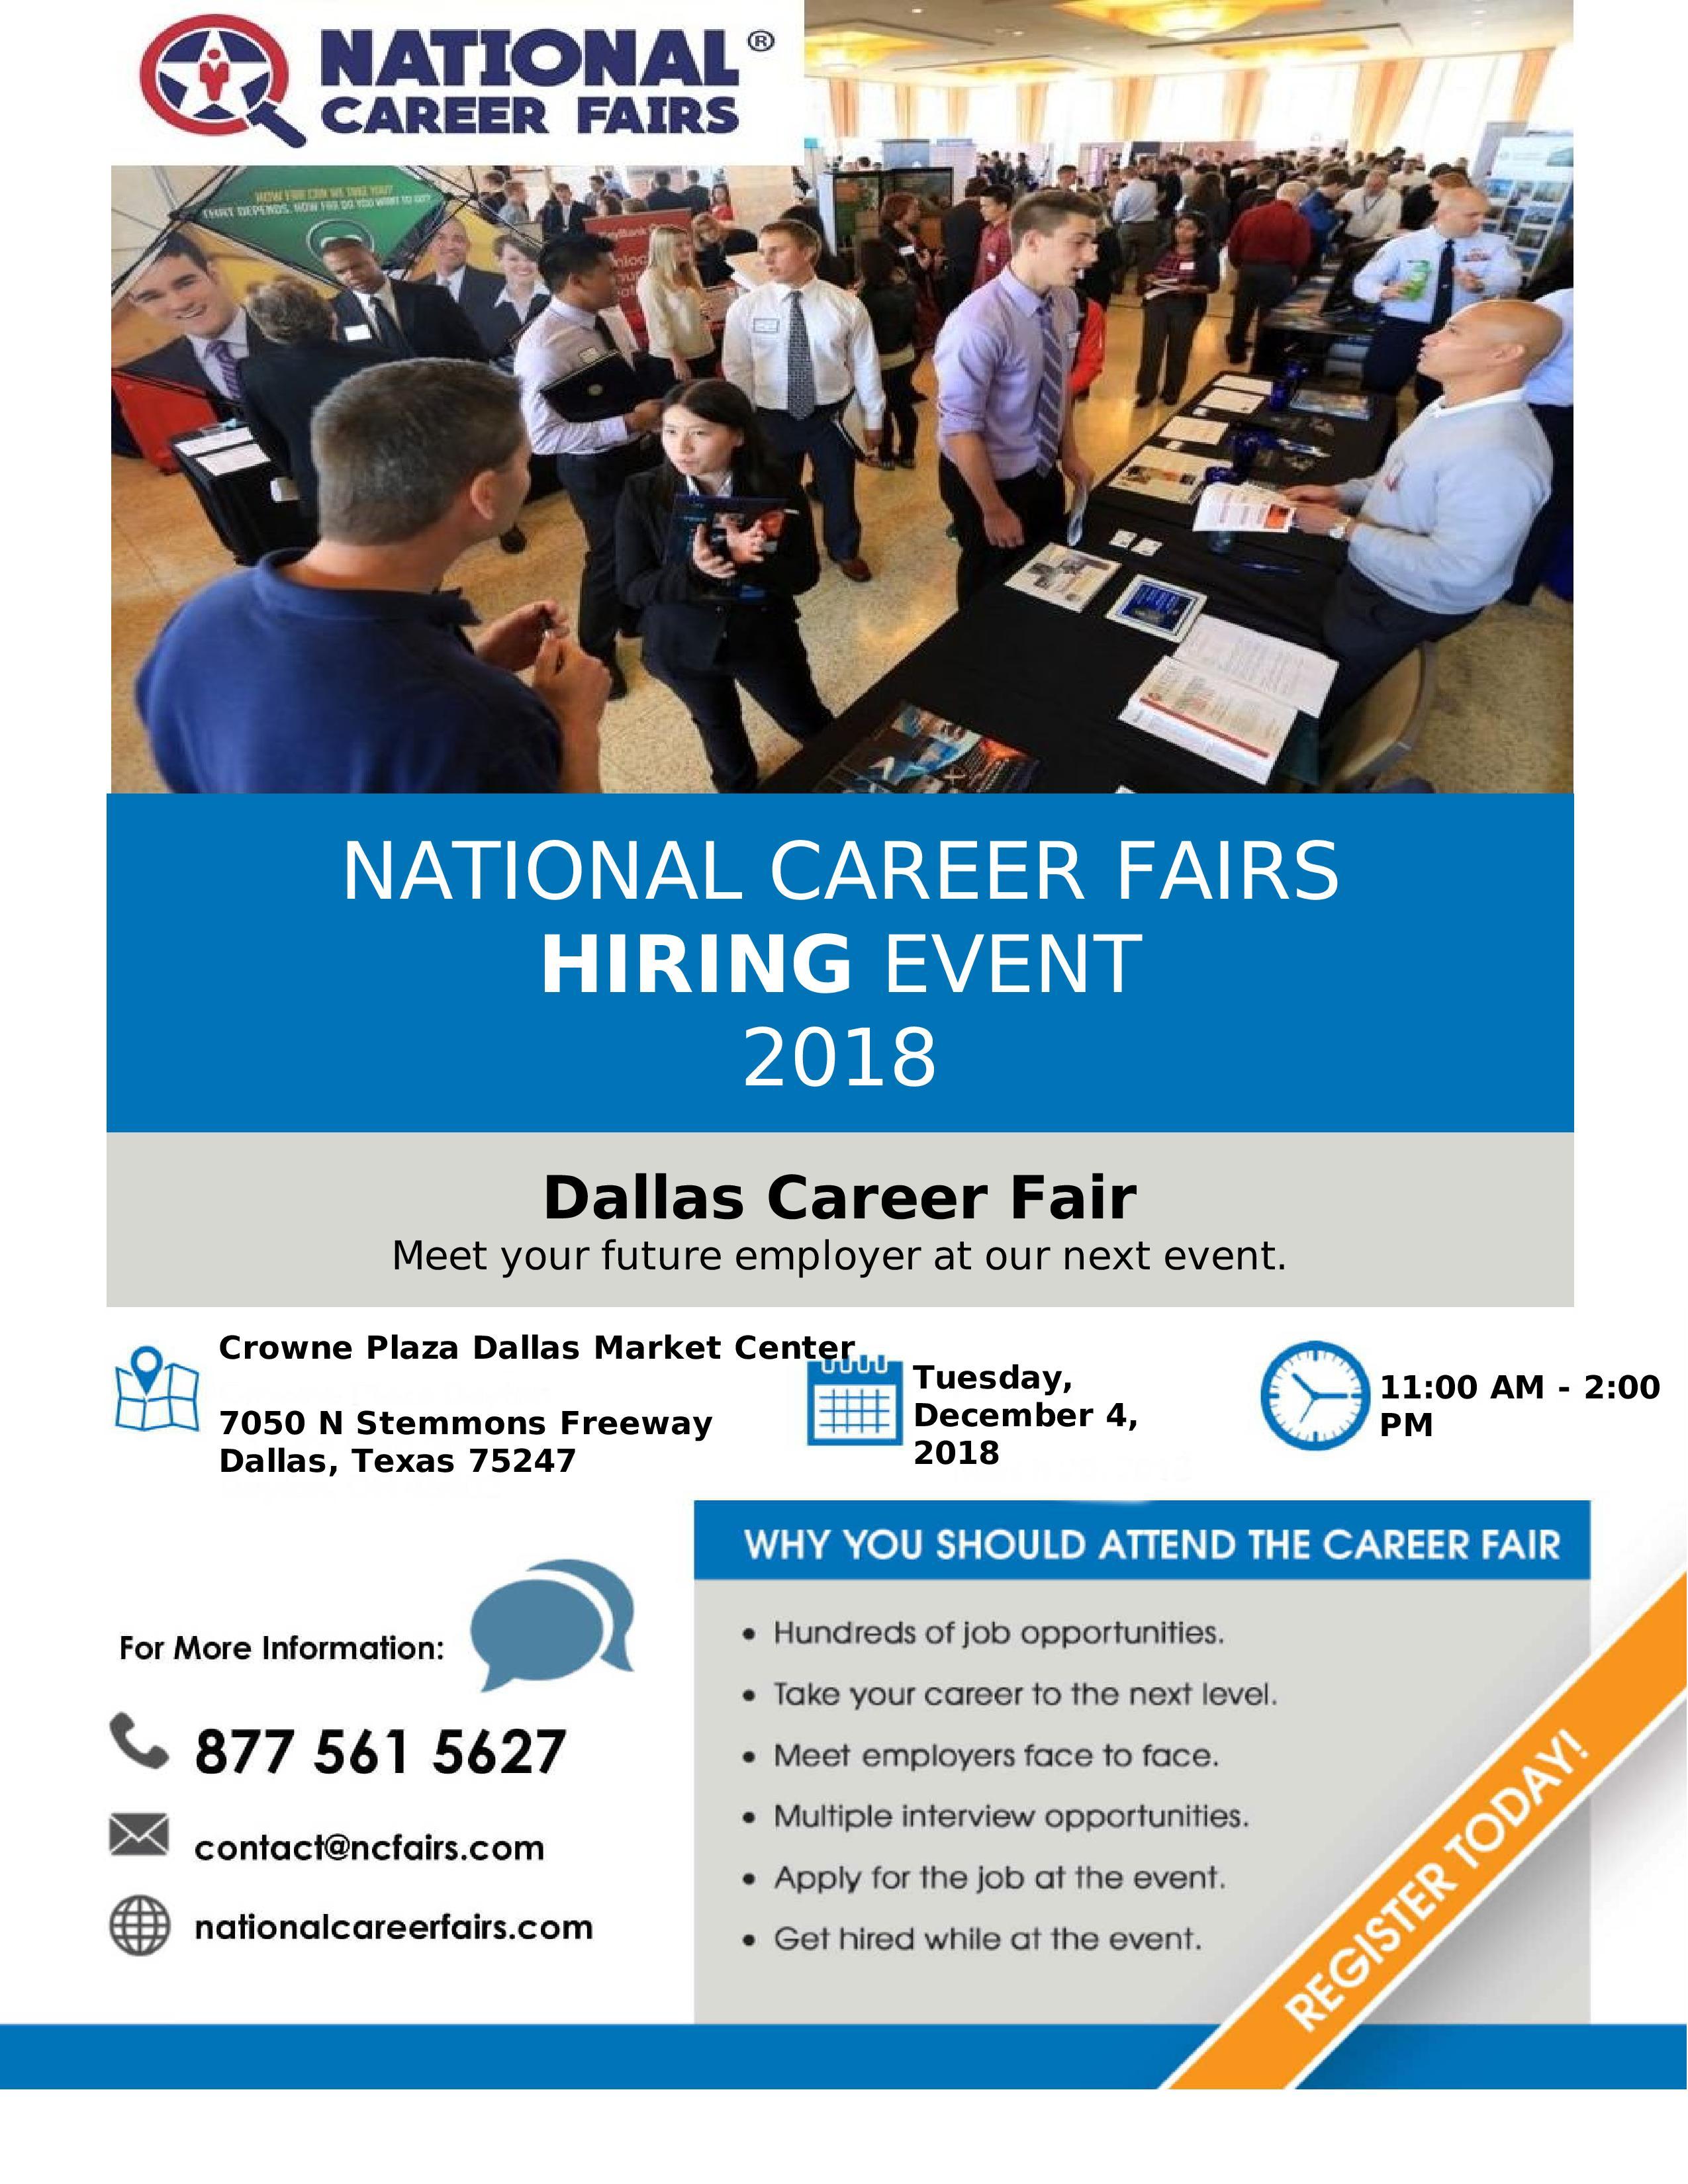 National Career Fairs Hiring Event